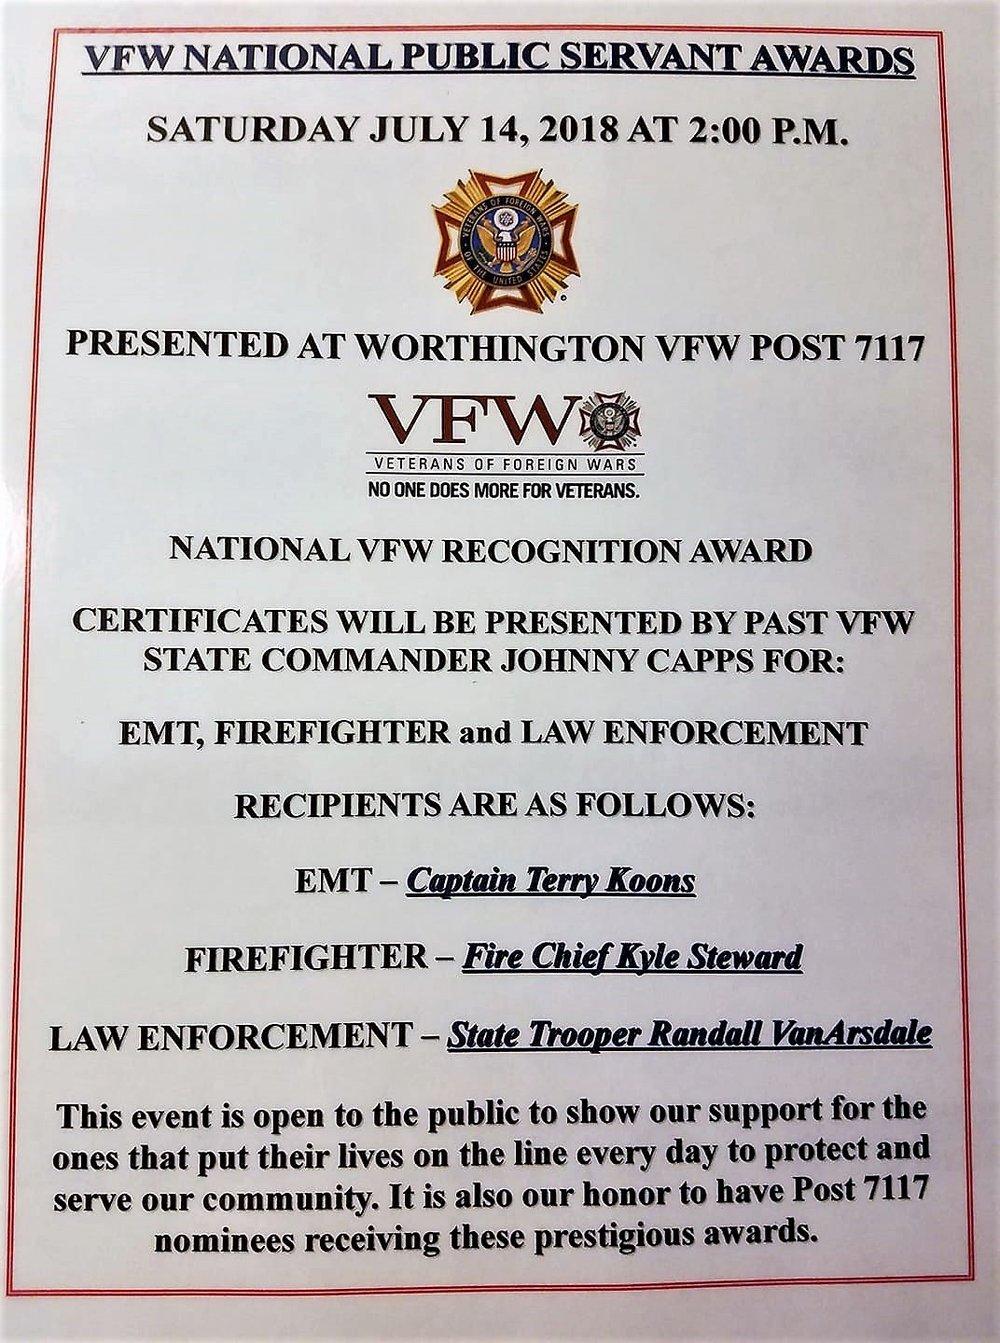 2018-07-12 VFW National Public Service Awards.jpg